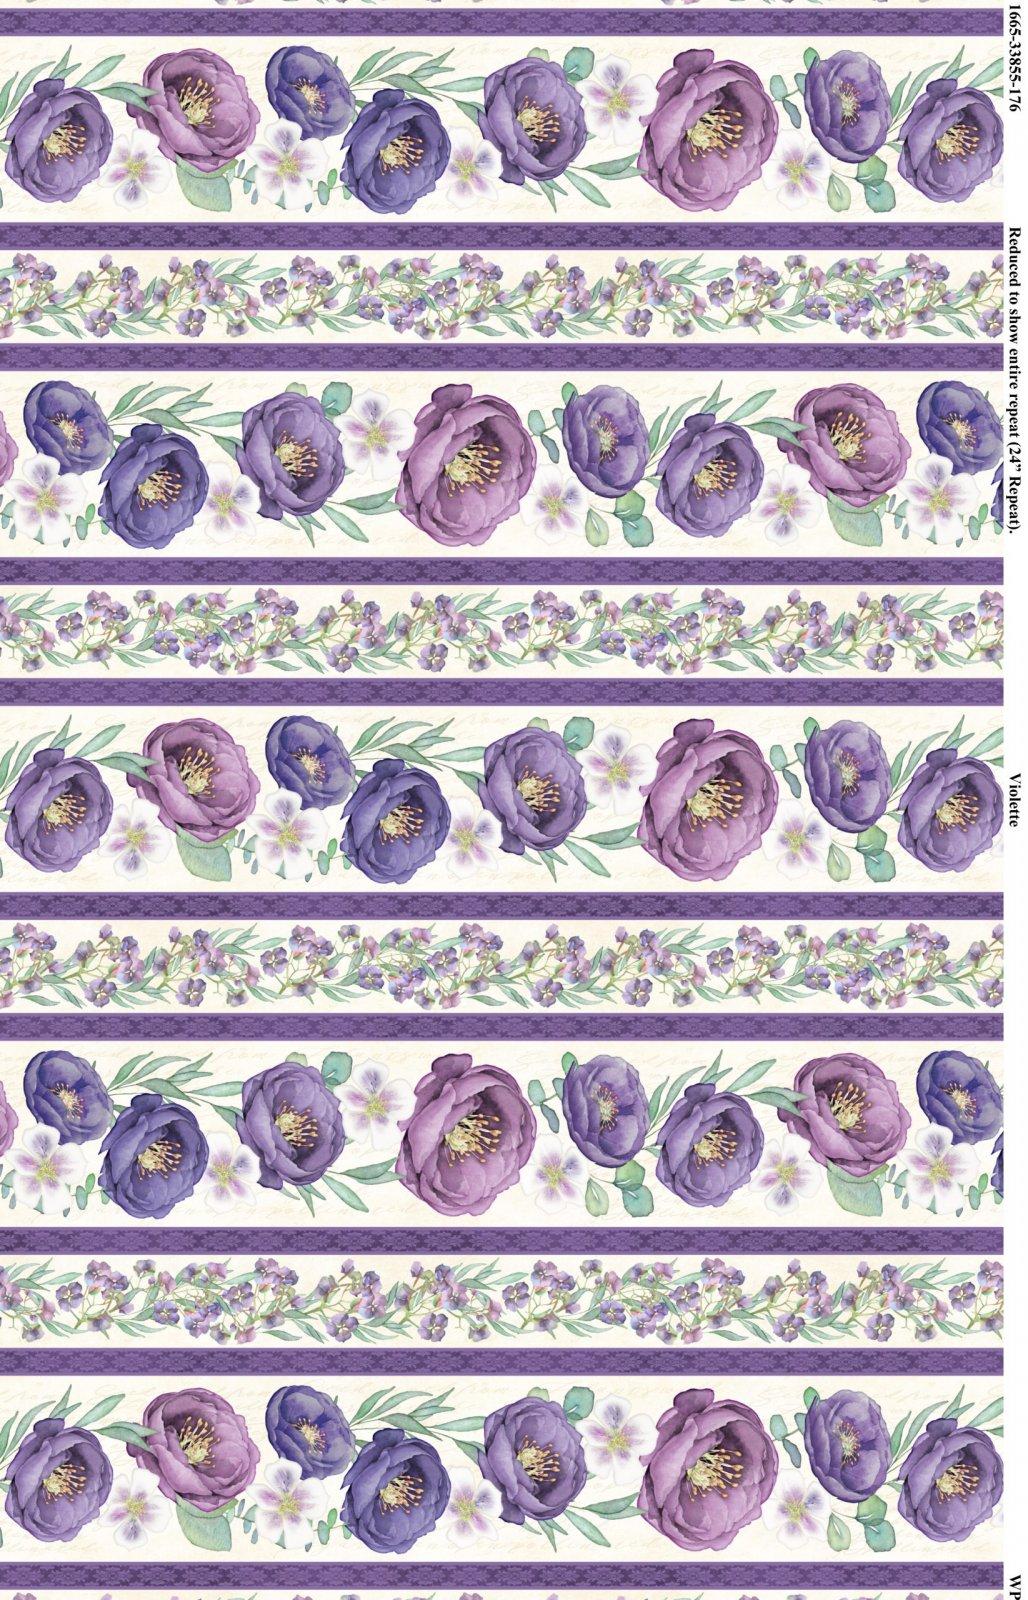 Violette 33855-176